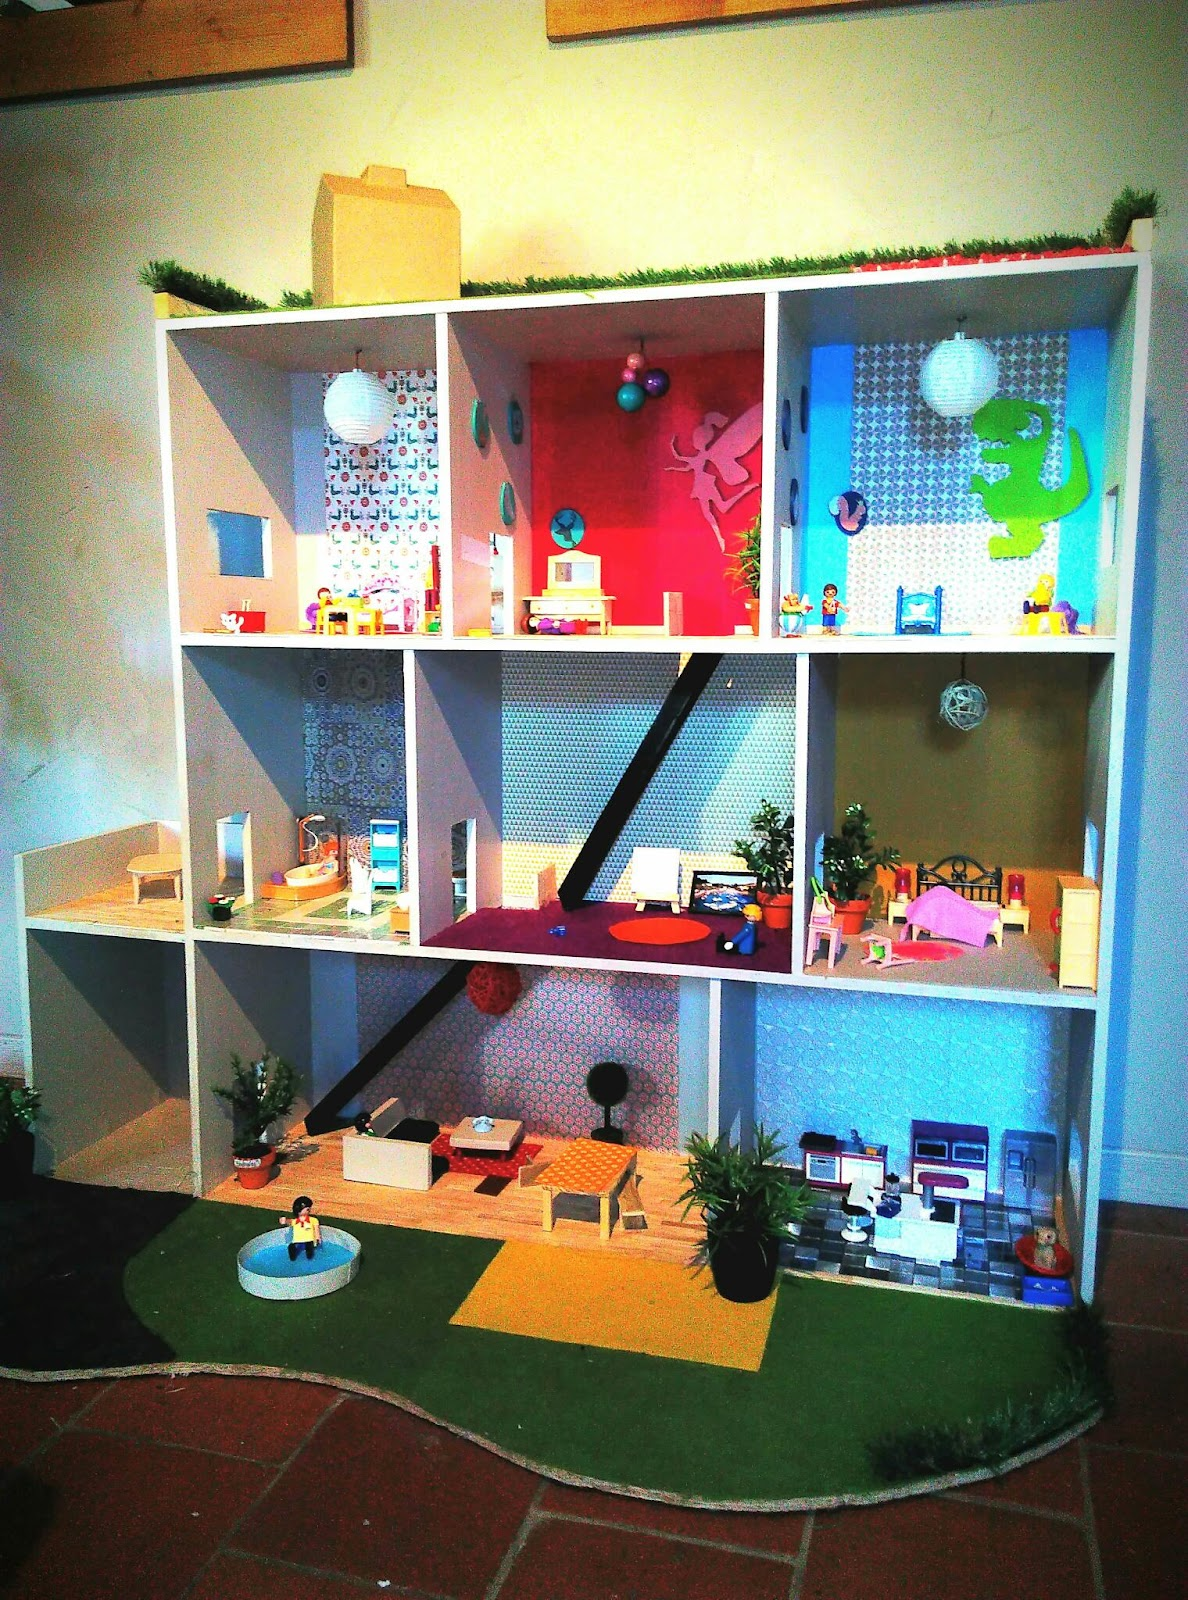 mon monde fait main ma maison playmobil. Black Bedroom Furniture Sets. Home Design Ideas